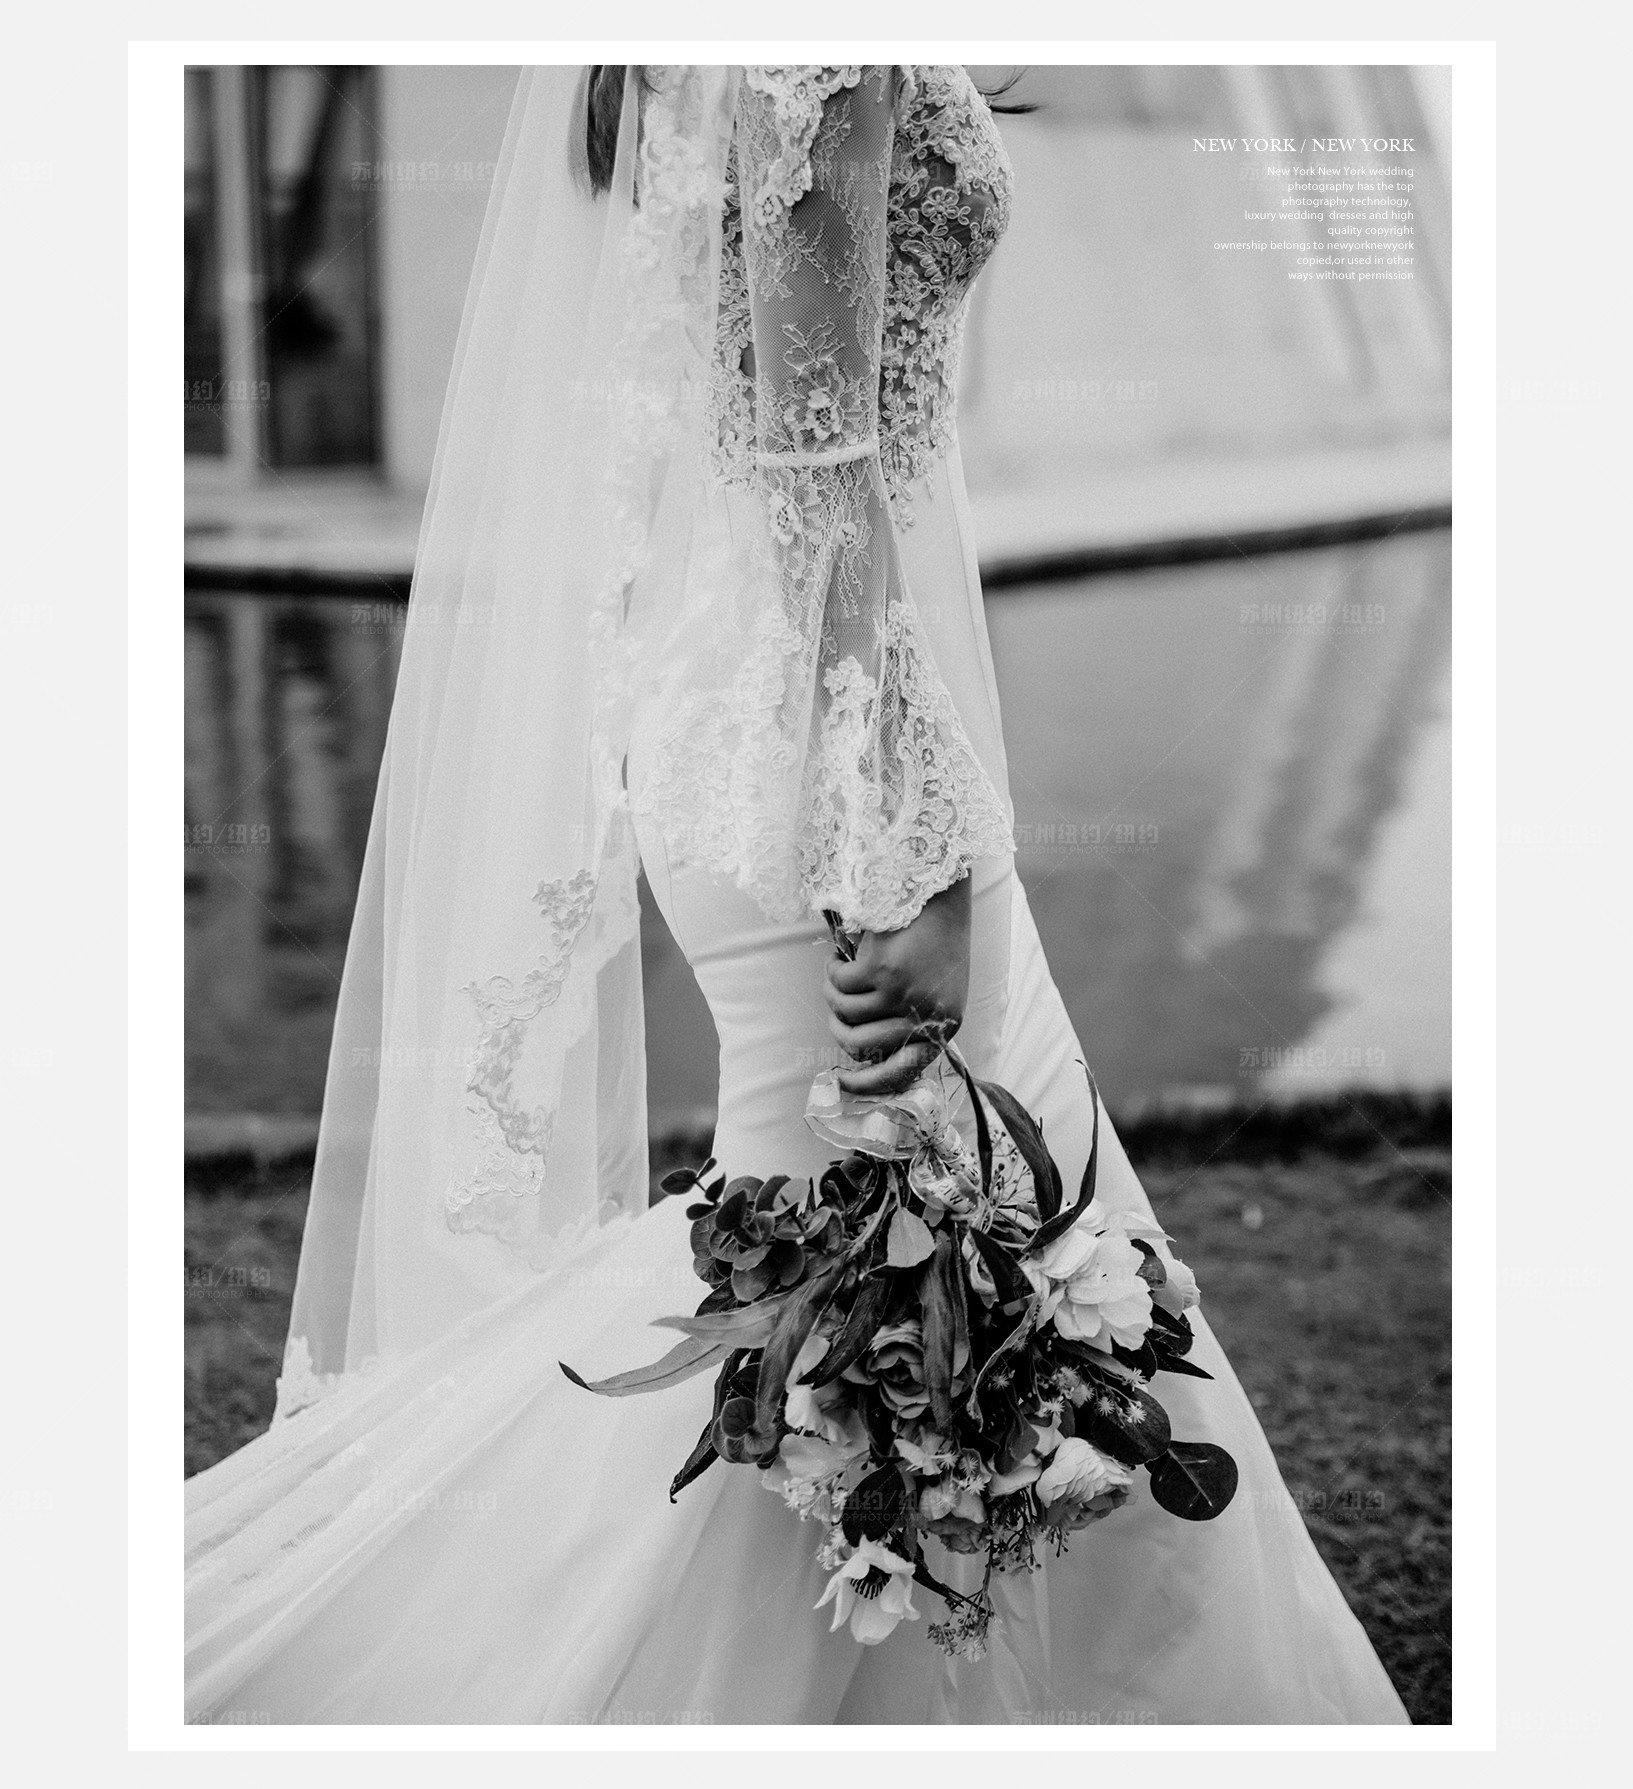 Mr.康 & Ms.凌(纽约纽约最新客照)婚纱摄影照